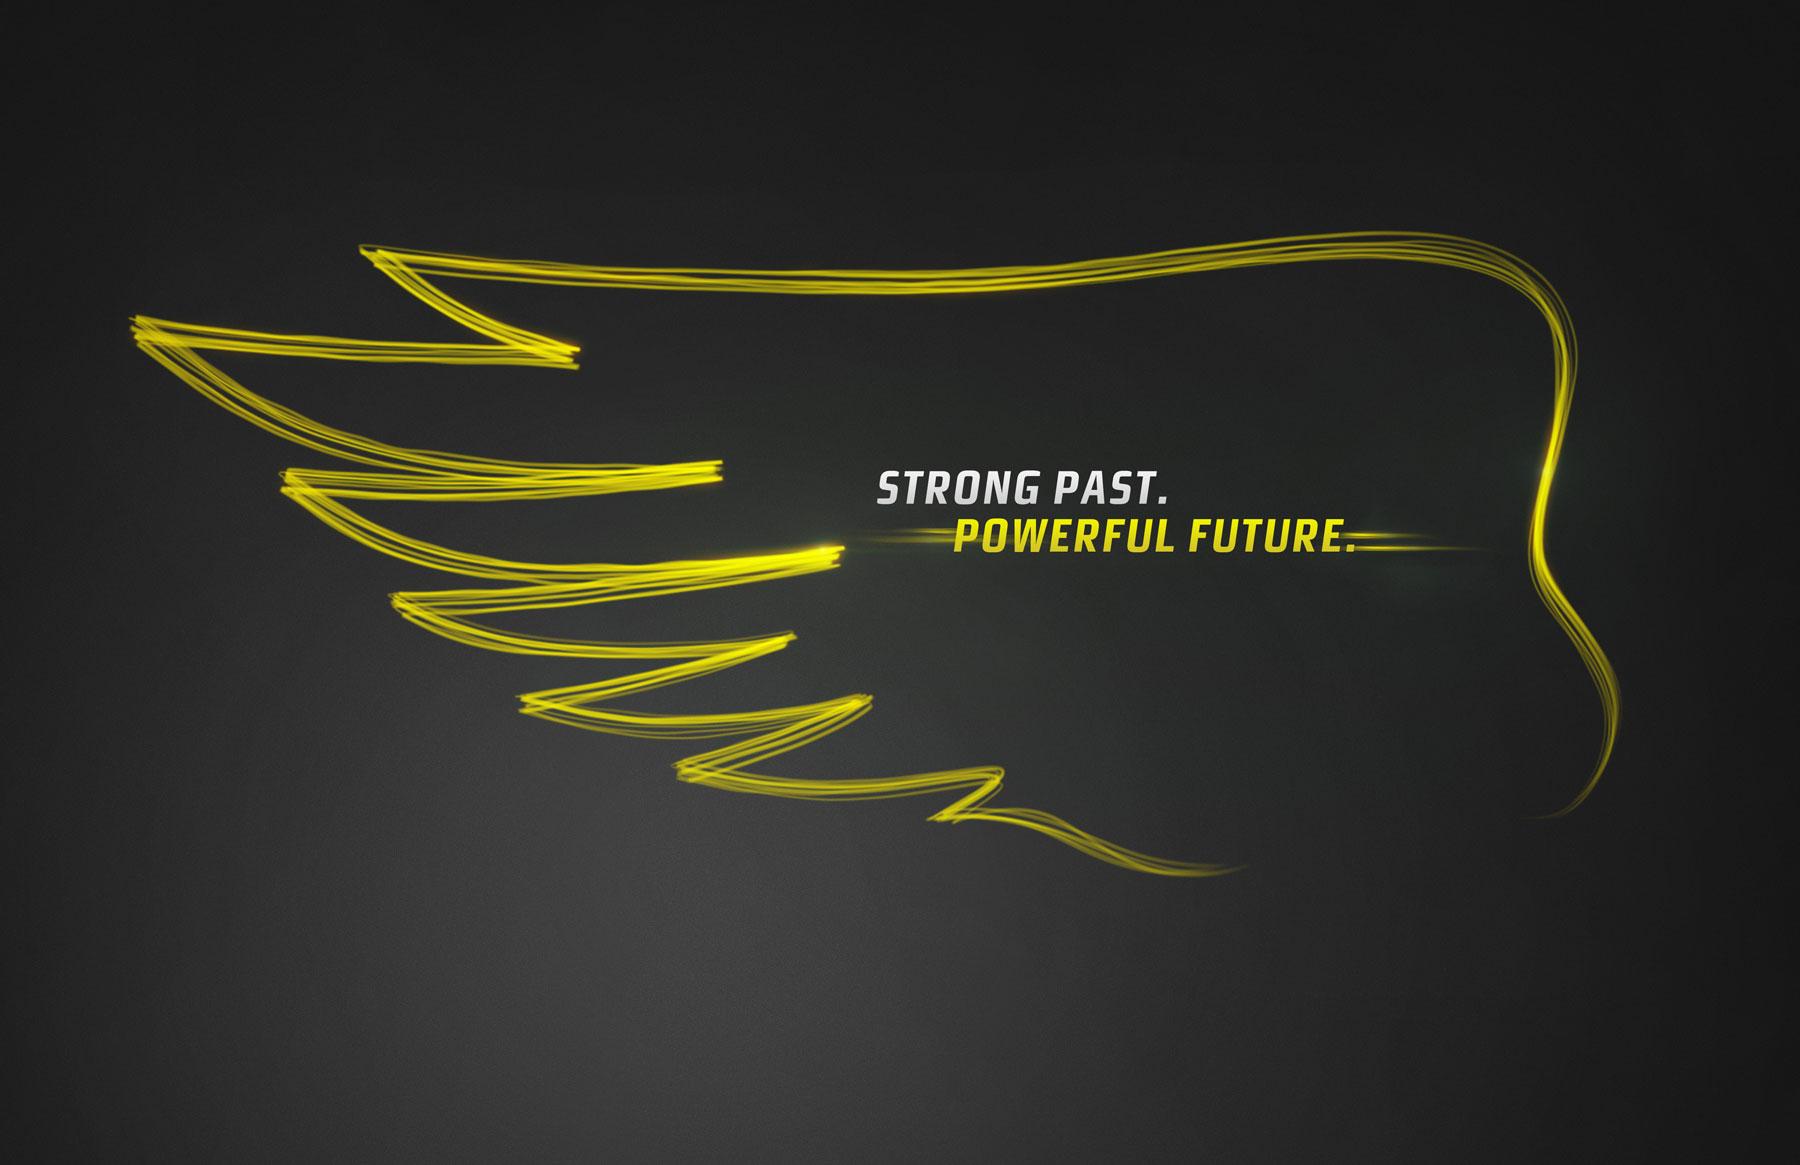 7-Dekalb—strong_past_powerfull_future